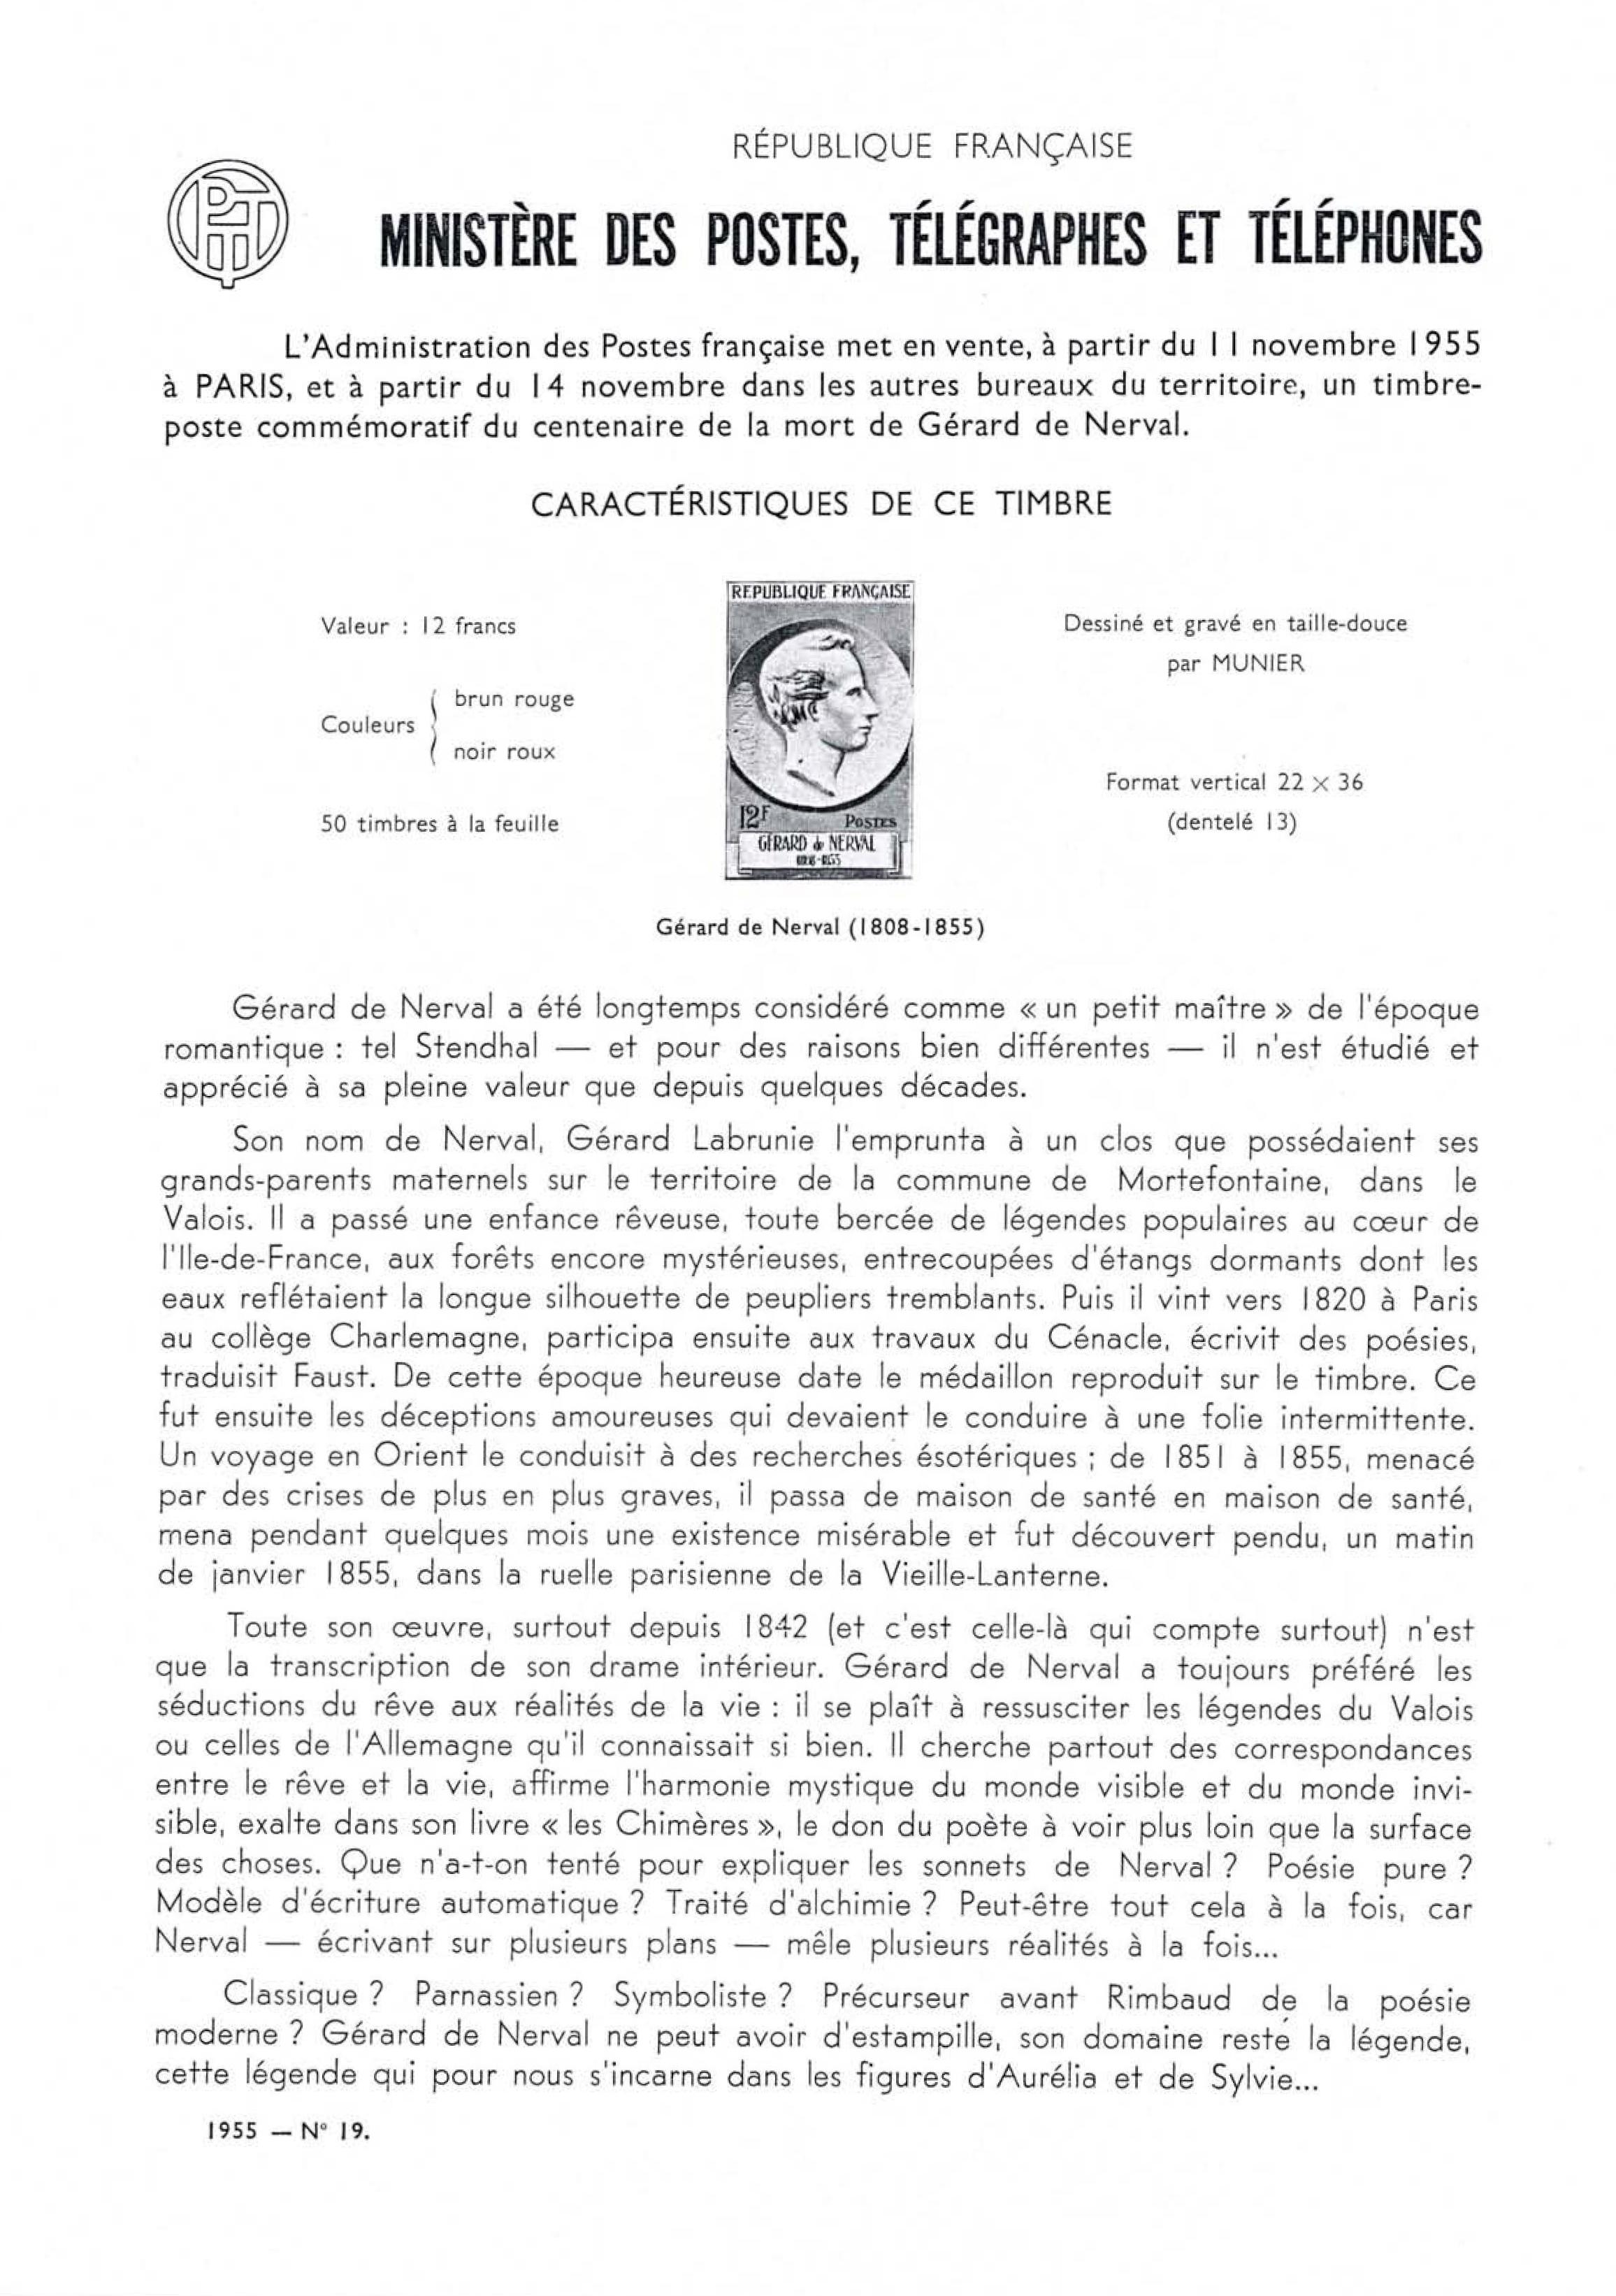 Cinghia trattorino rasaerba BEE FLY 300-700 GRILLO 54393